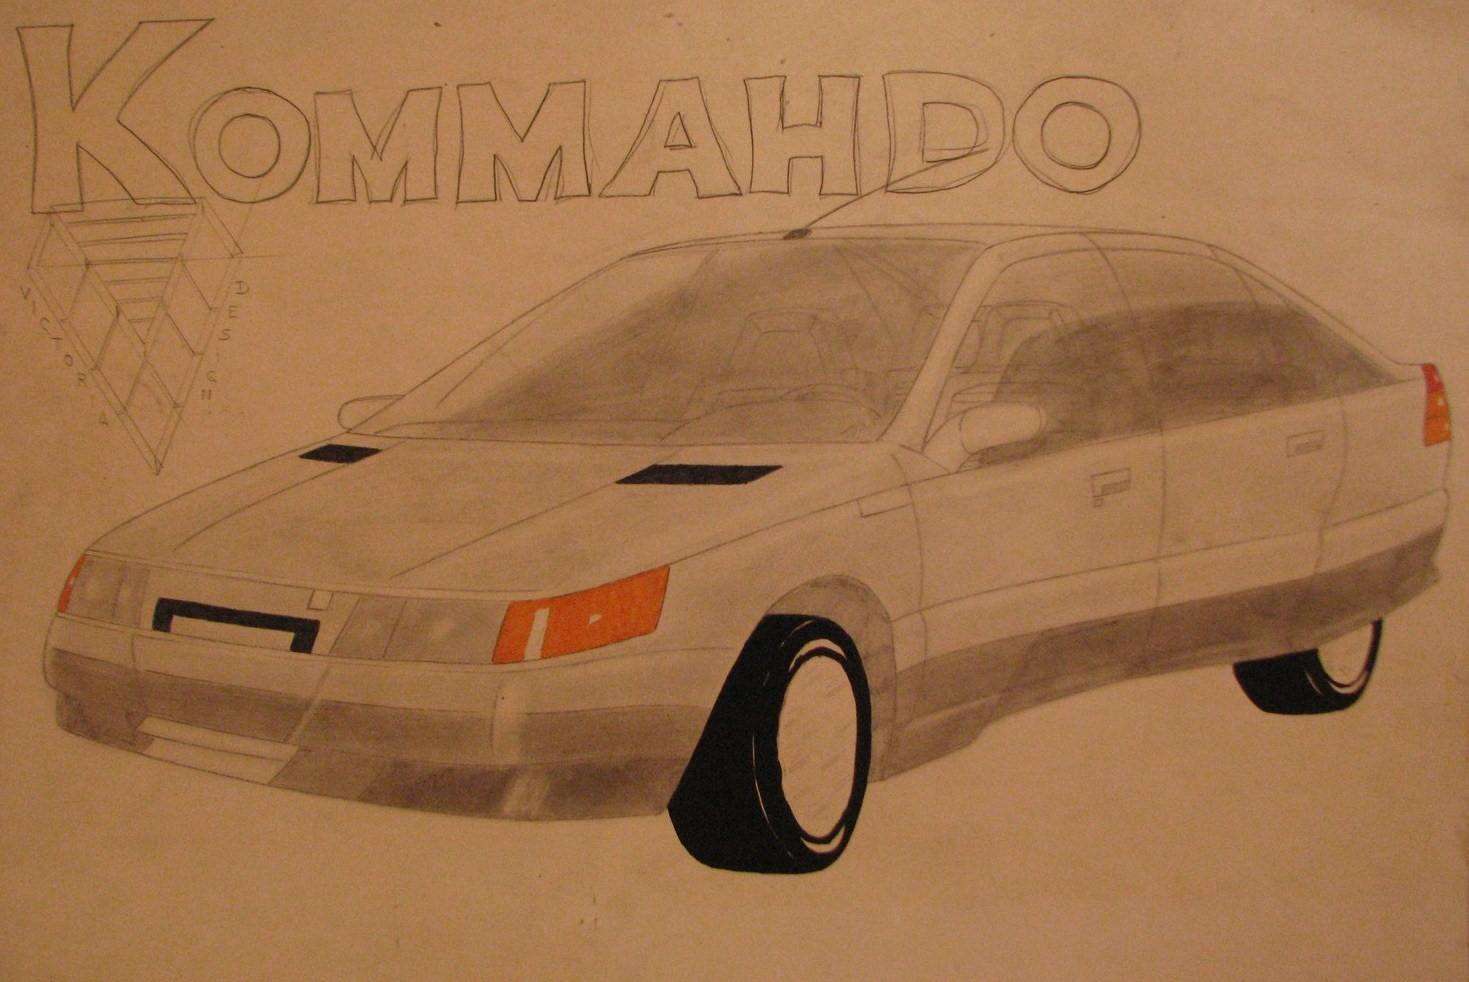 1990. Kommando